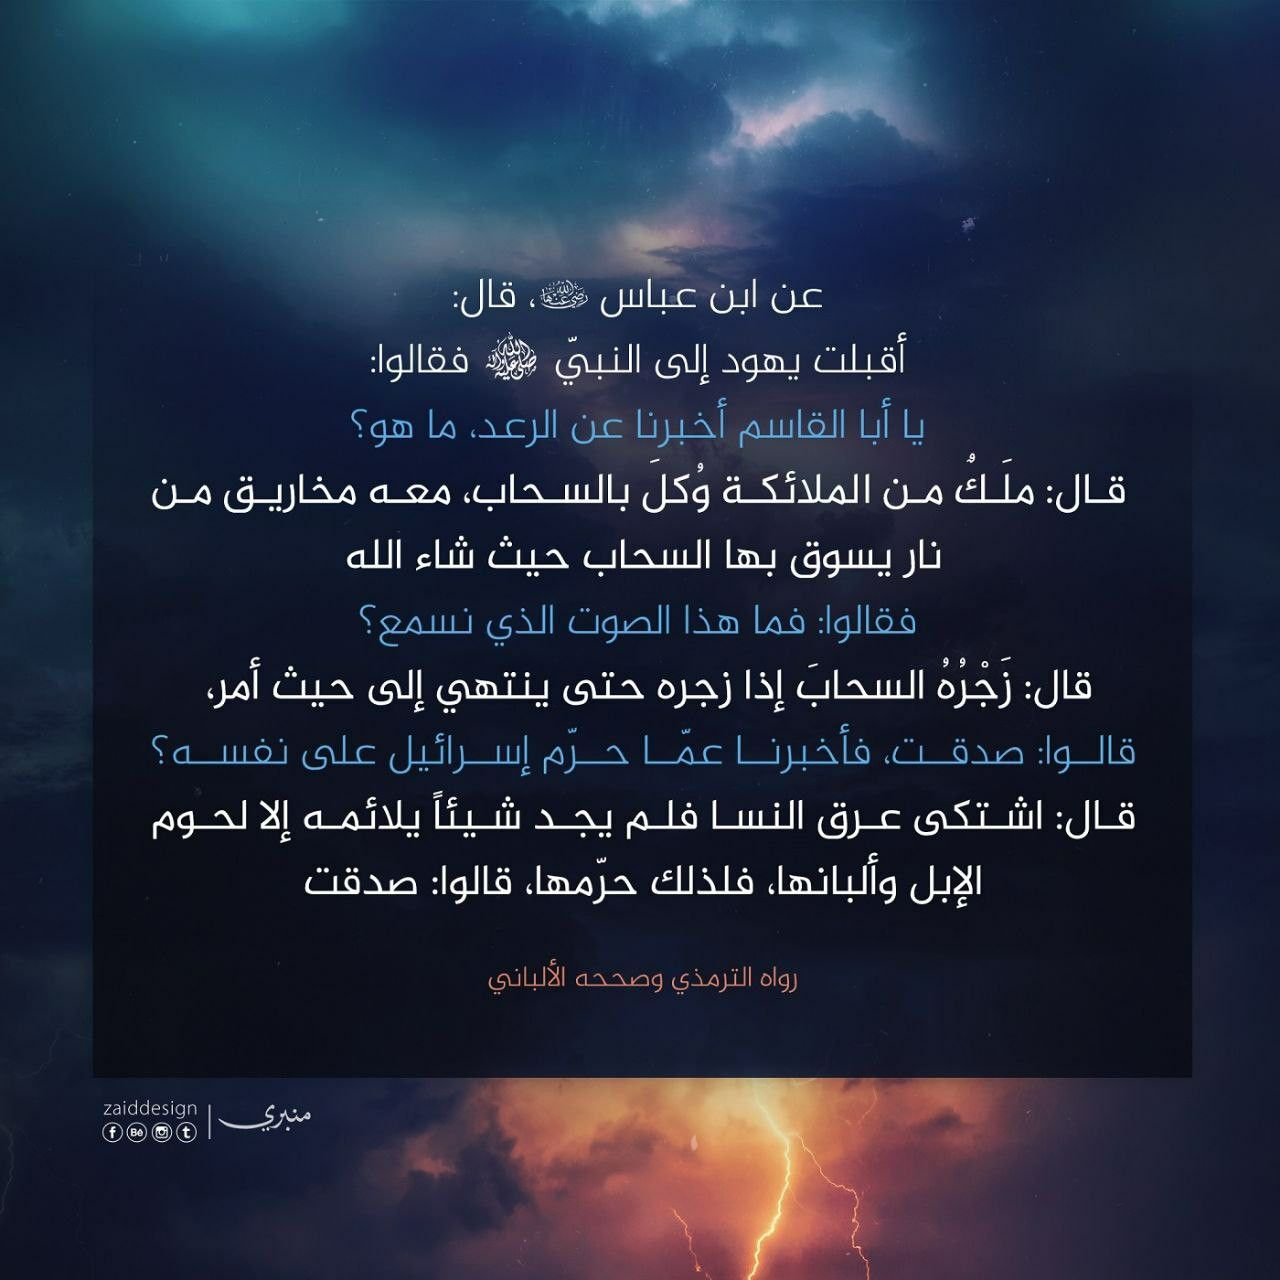 Pin By Ghada Moustafa On Islamic In 2020 Islamic Design Islam Social Media